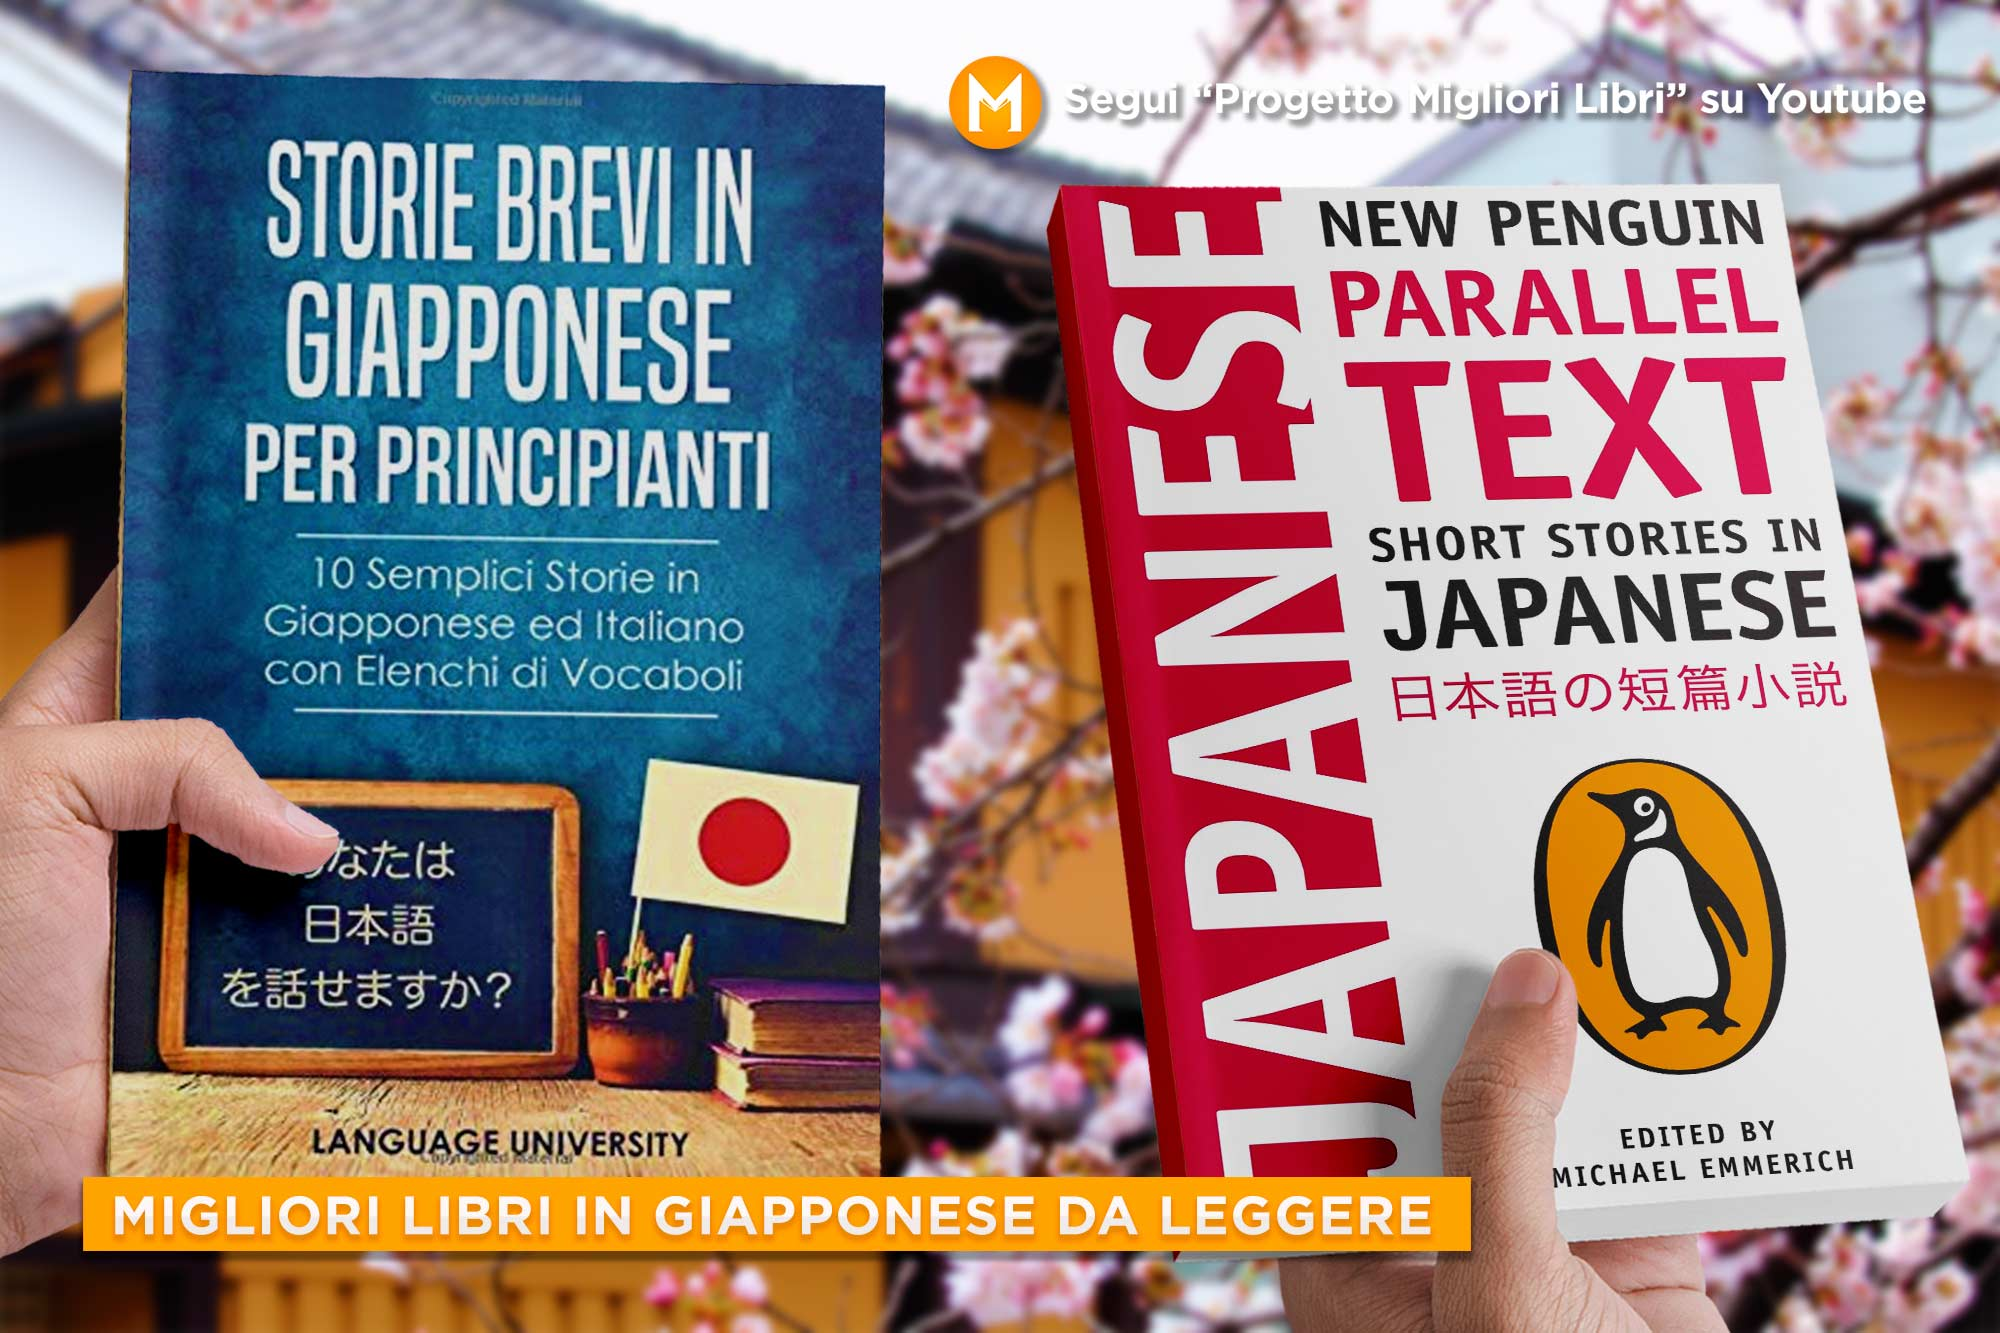 migliori-libri-in-giapponese-da-leggere